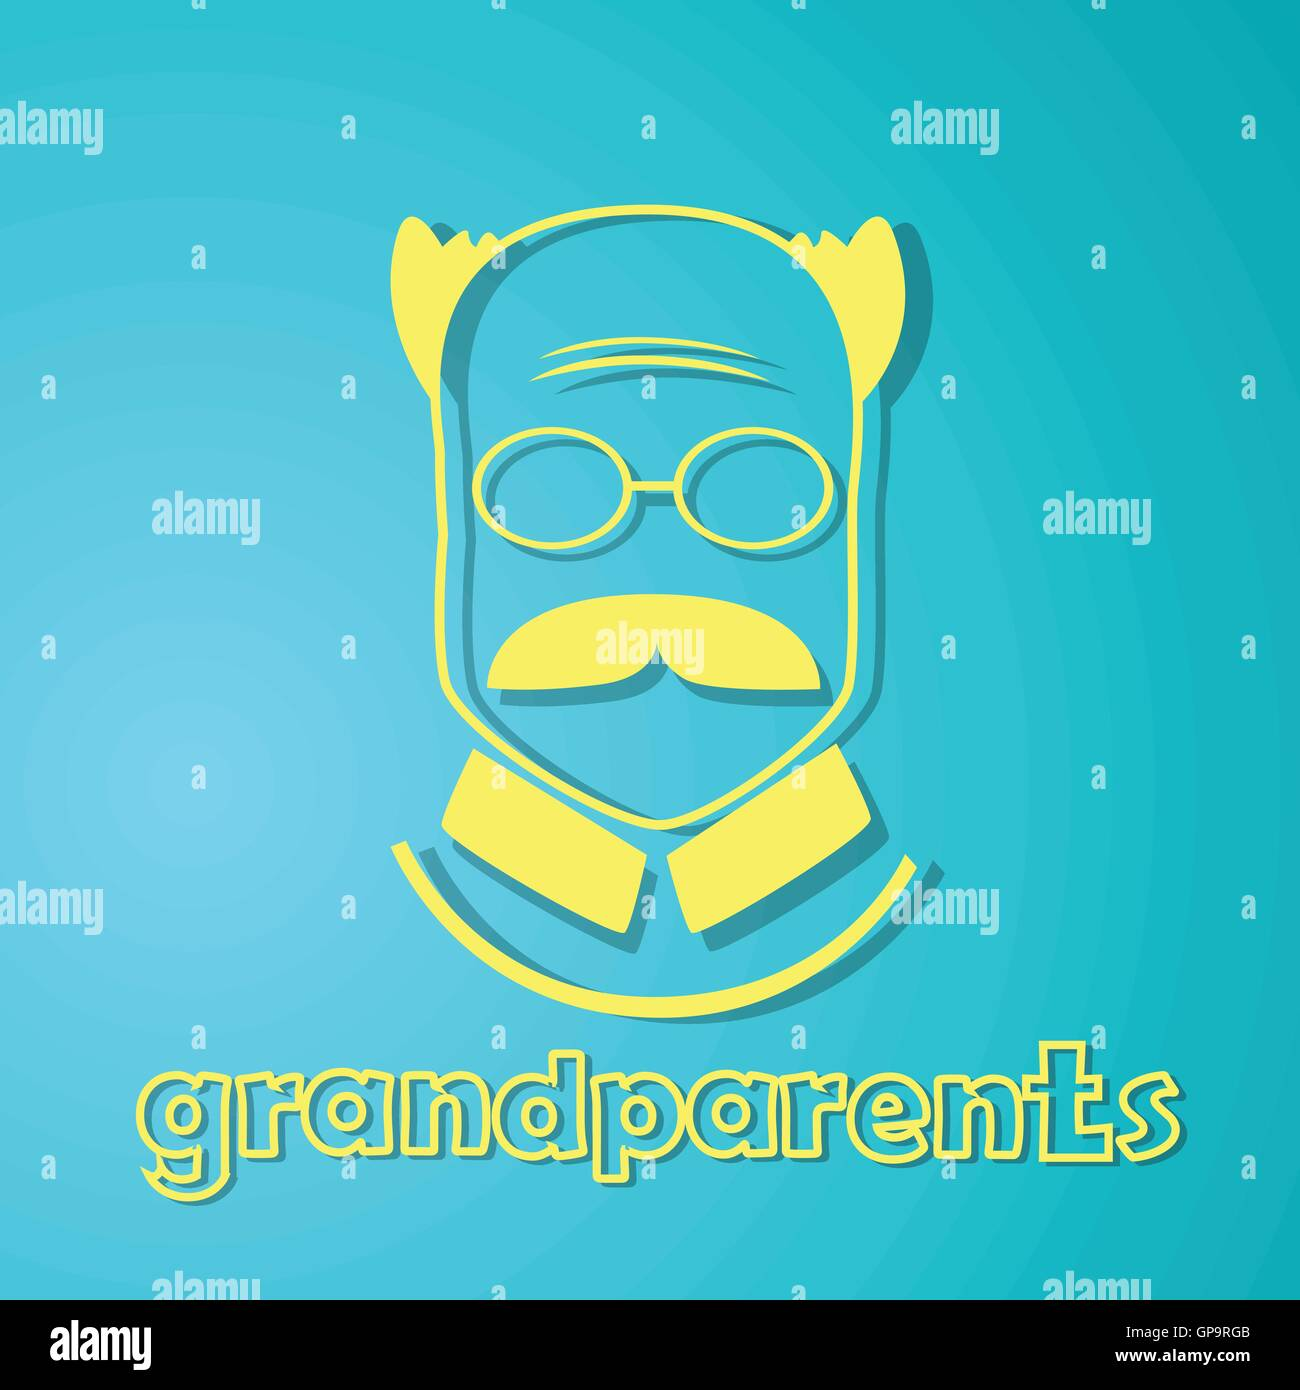 Grandfather silhouette happy grandparents day greeting card stock grandfather silhouette happy grandparents day greeting card m4hsunfo